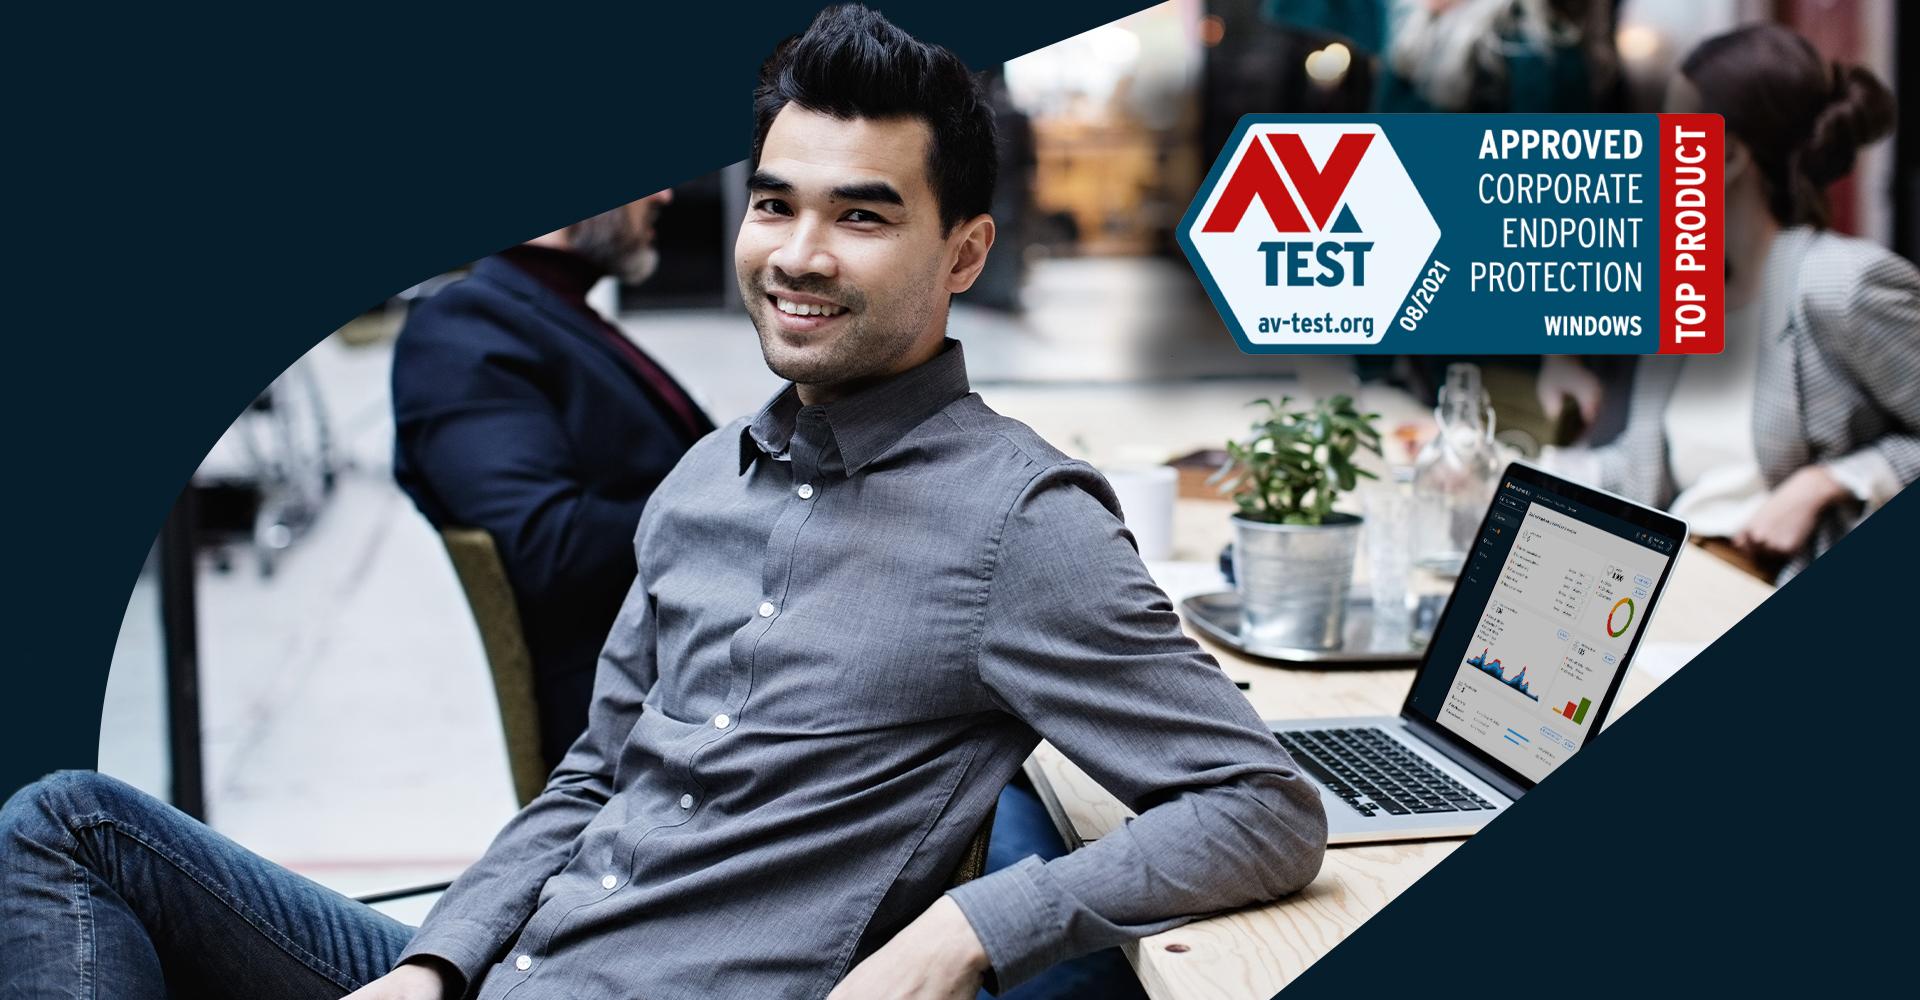 Avast Business Takes Home AV-TEST Top Rated Award | Avast